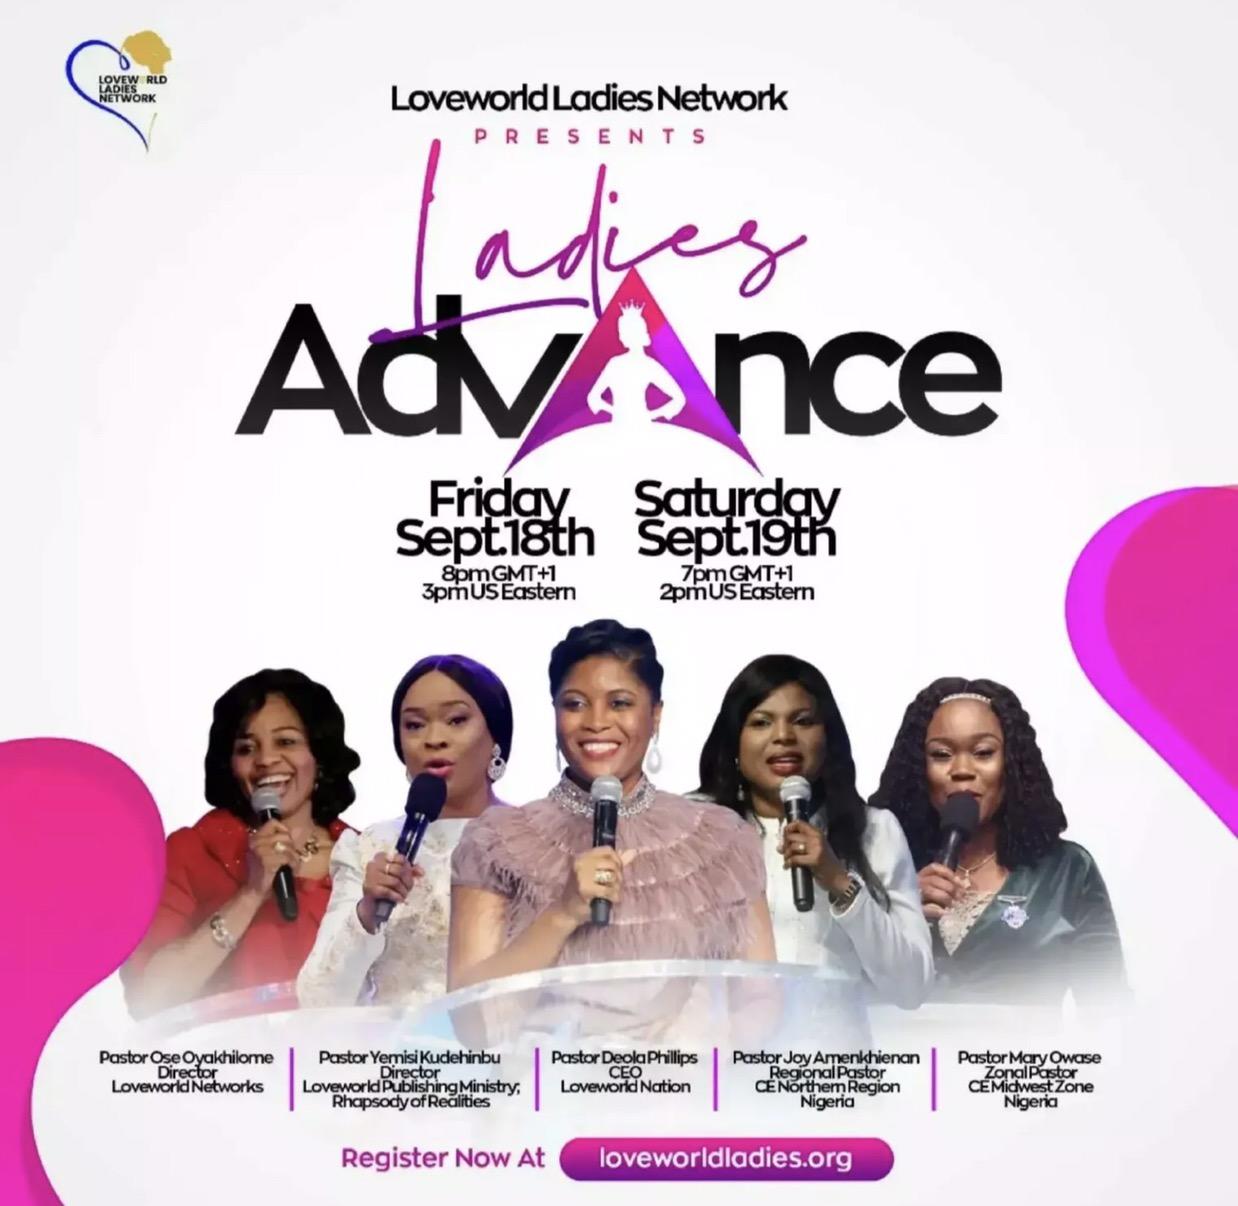 🌸 LADIES' ADVANCE! 🌸 Get